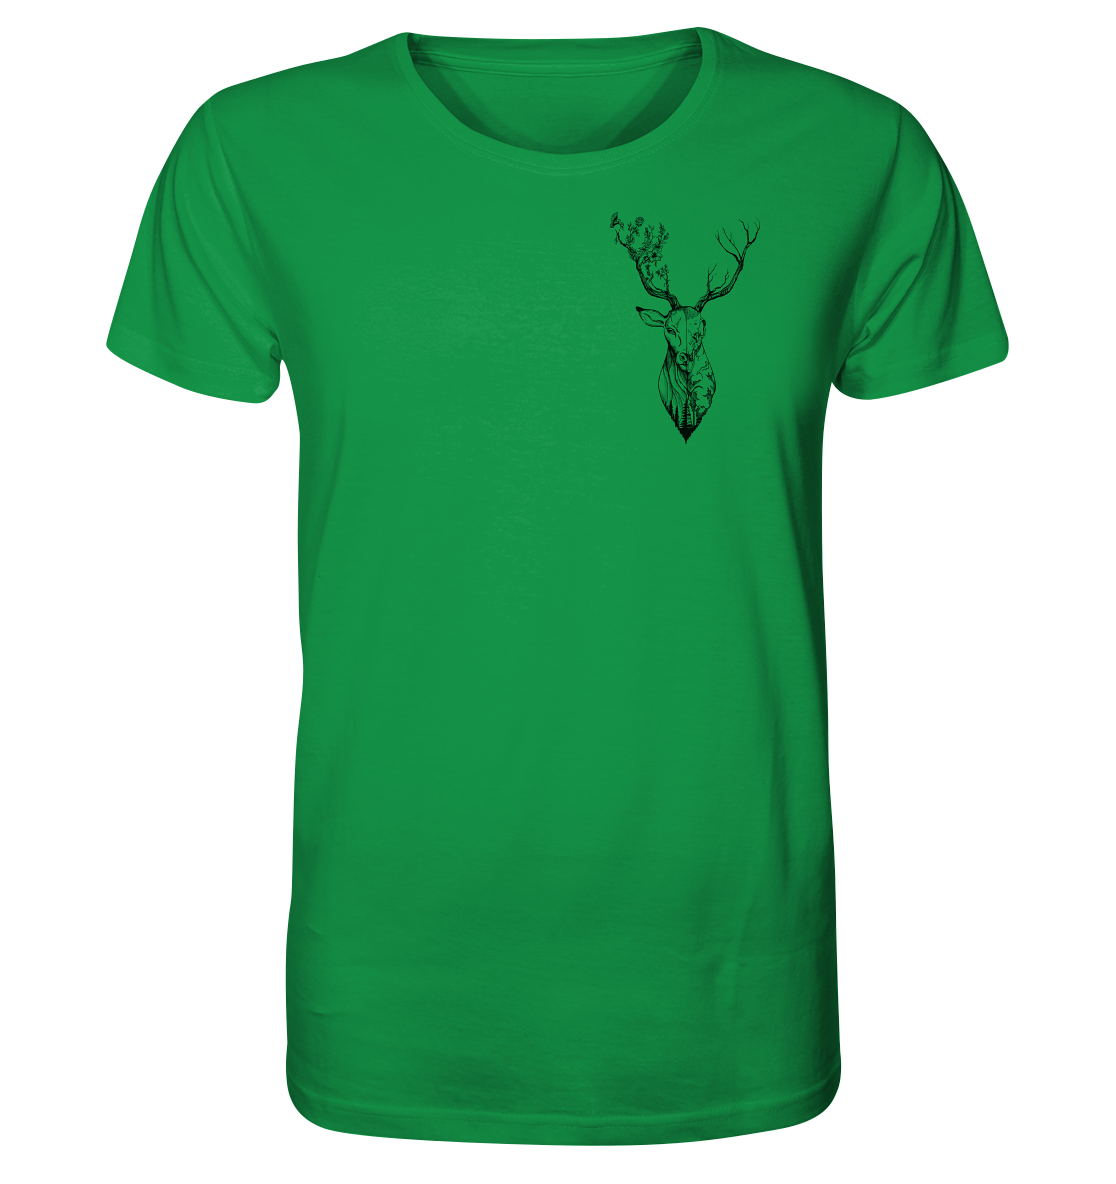 front-organic-shirt-149348-1116x-13.png